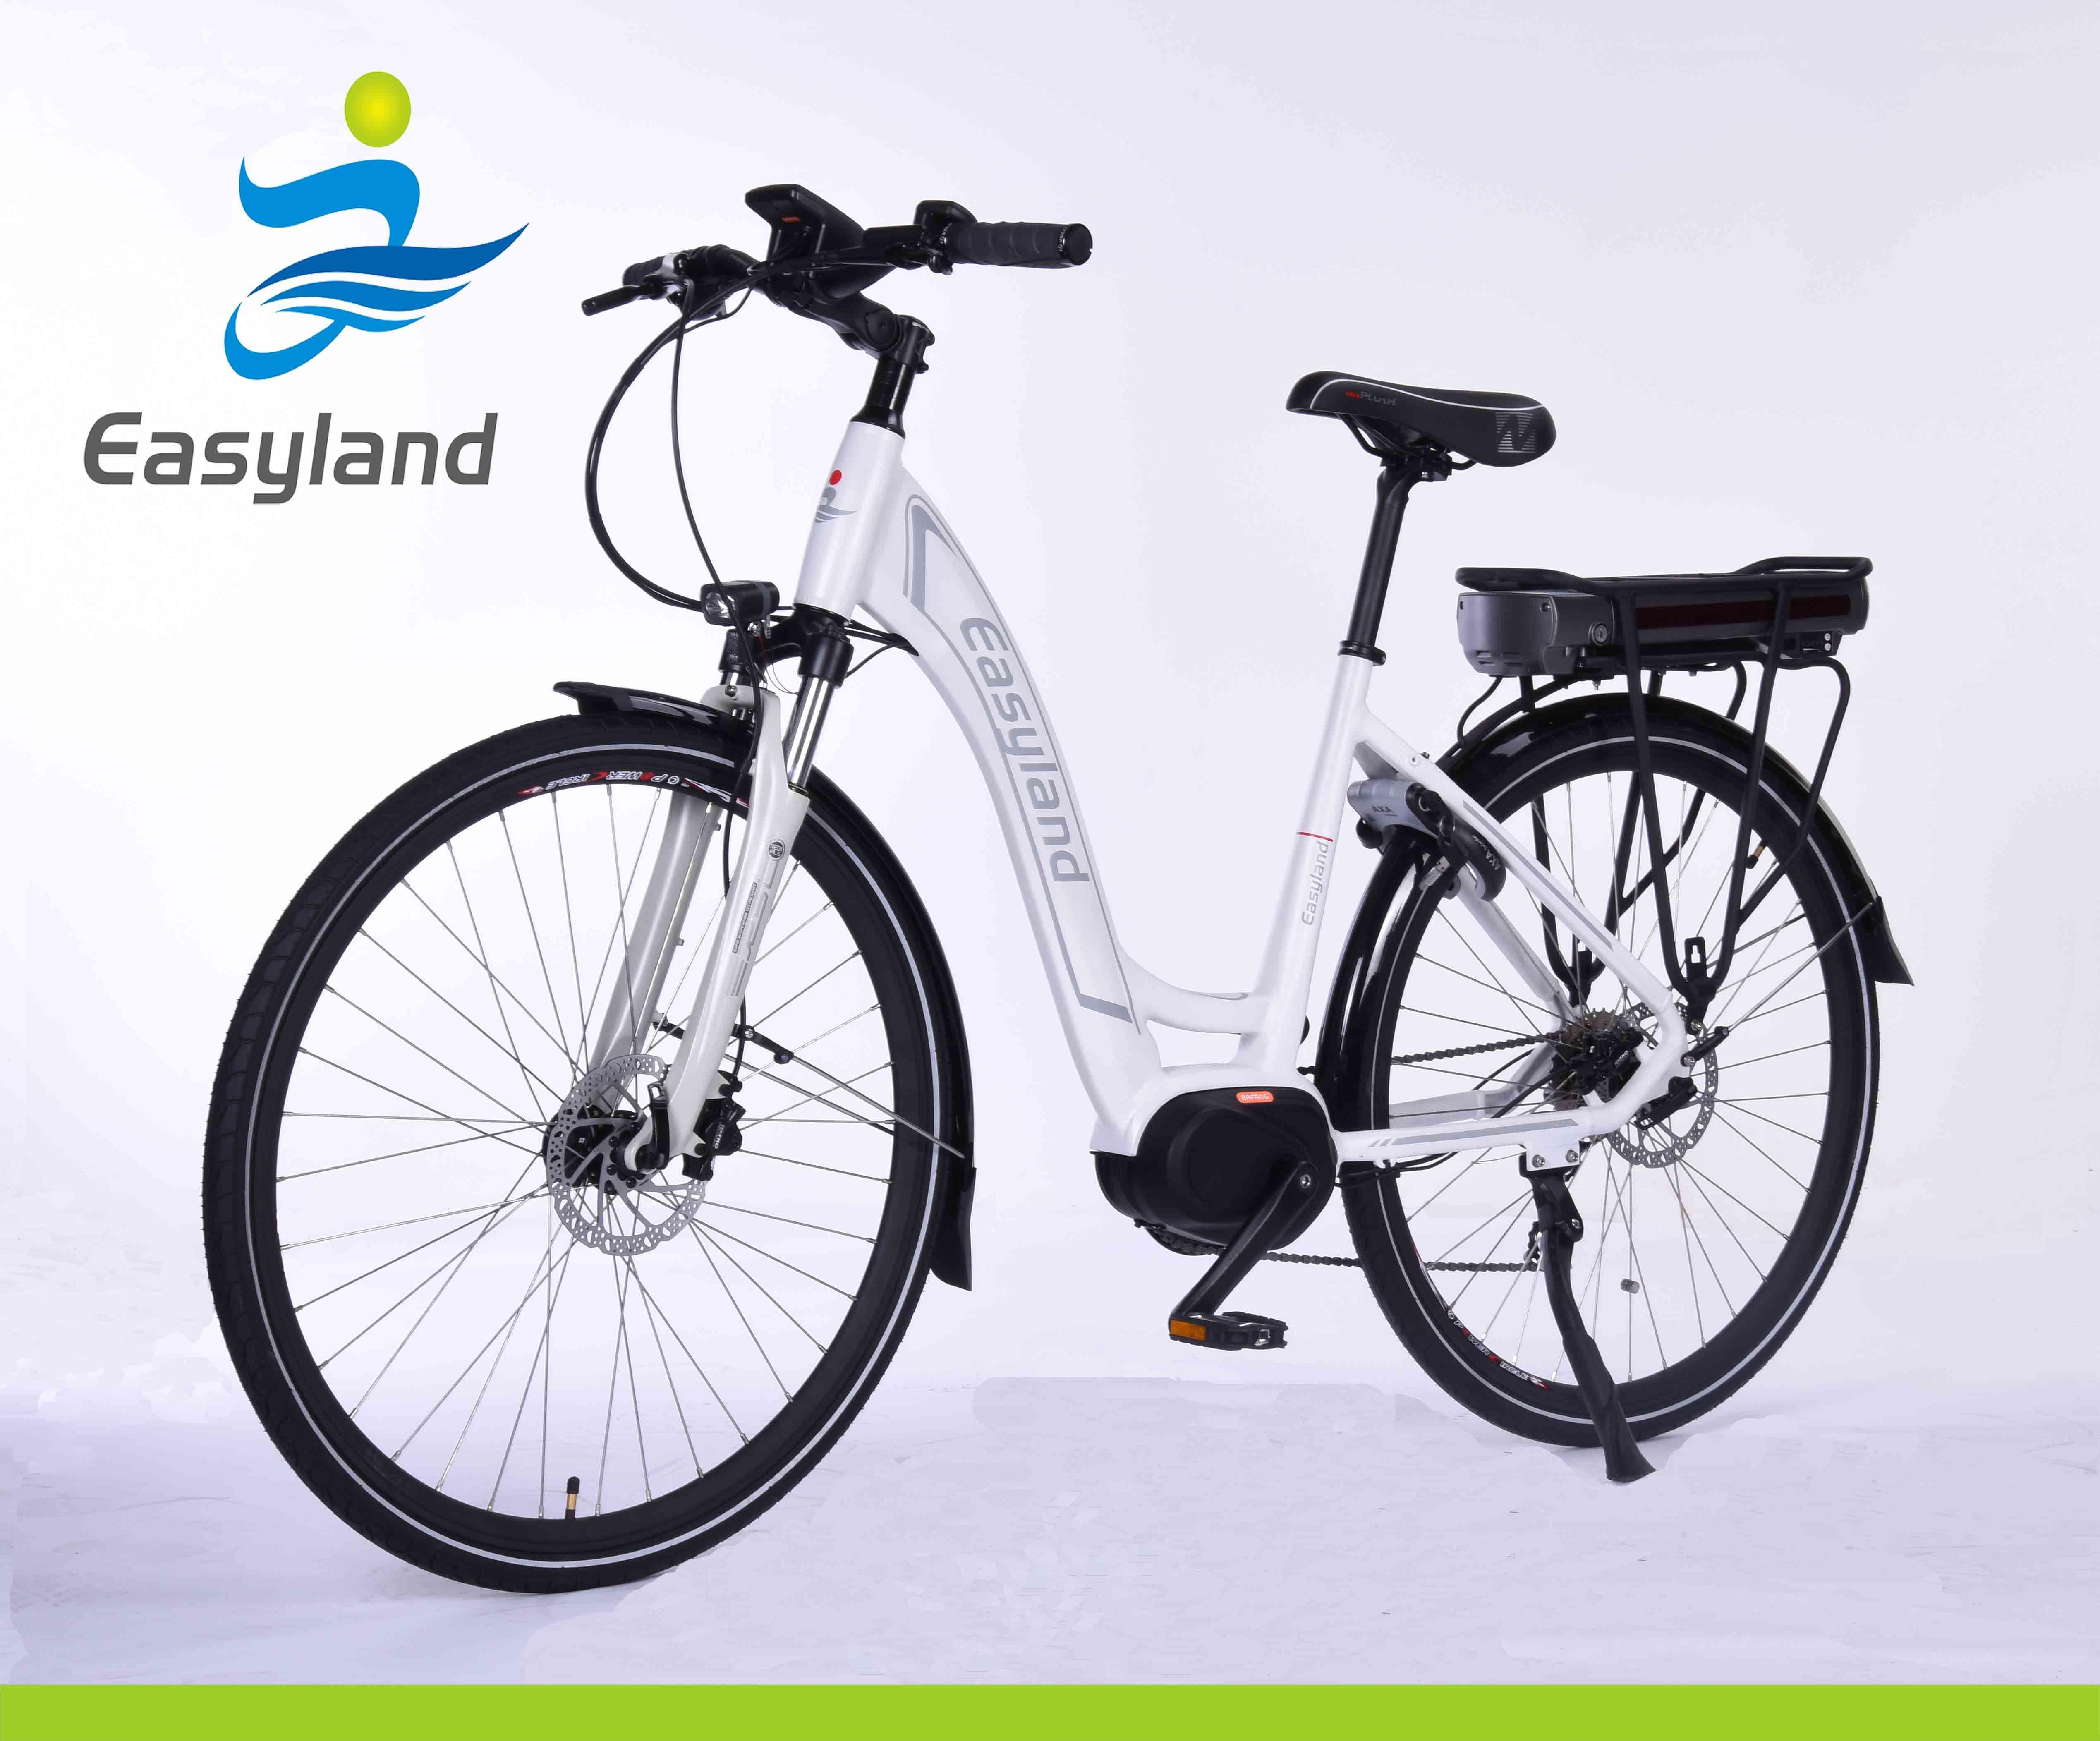 36V Electric Bike with SANYO Lithium Battery EL-dB7012L